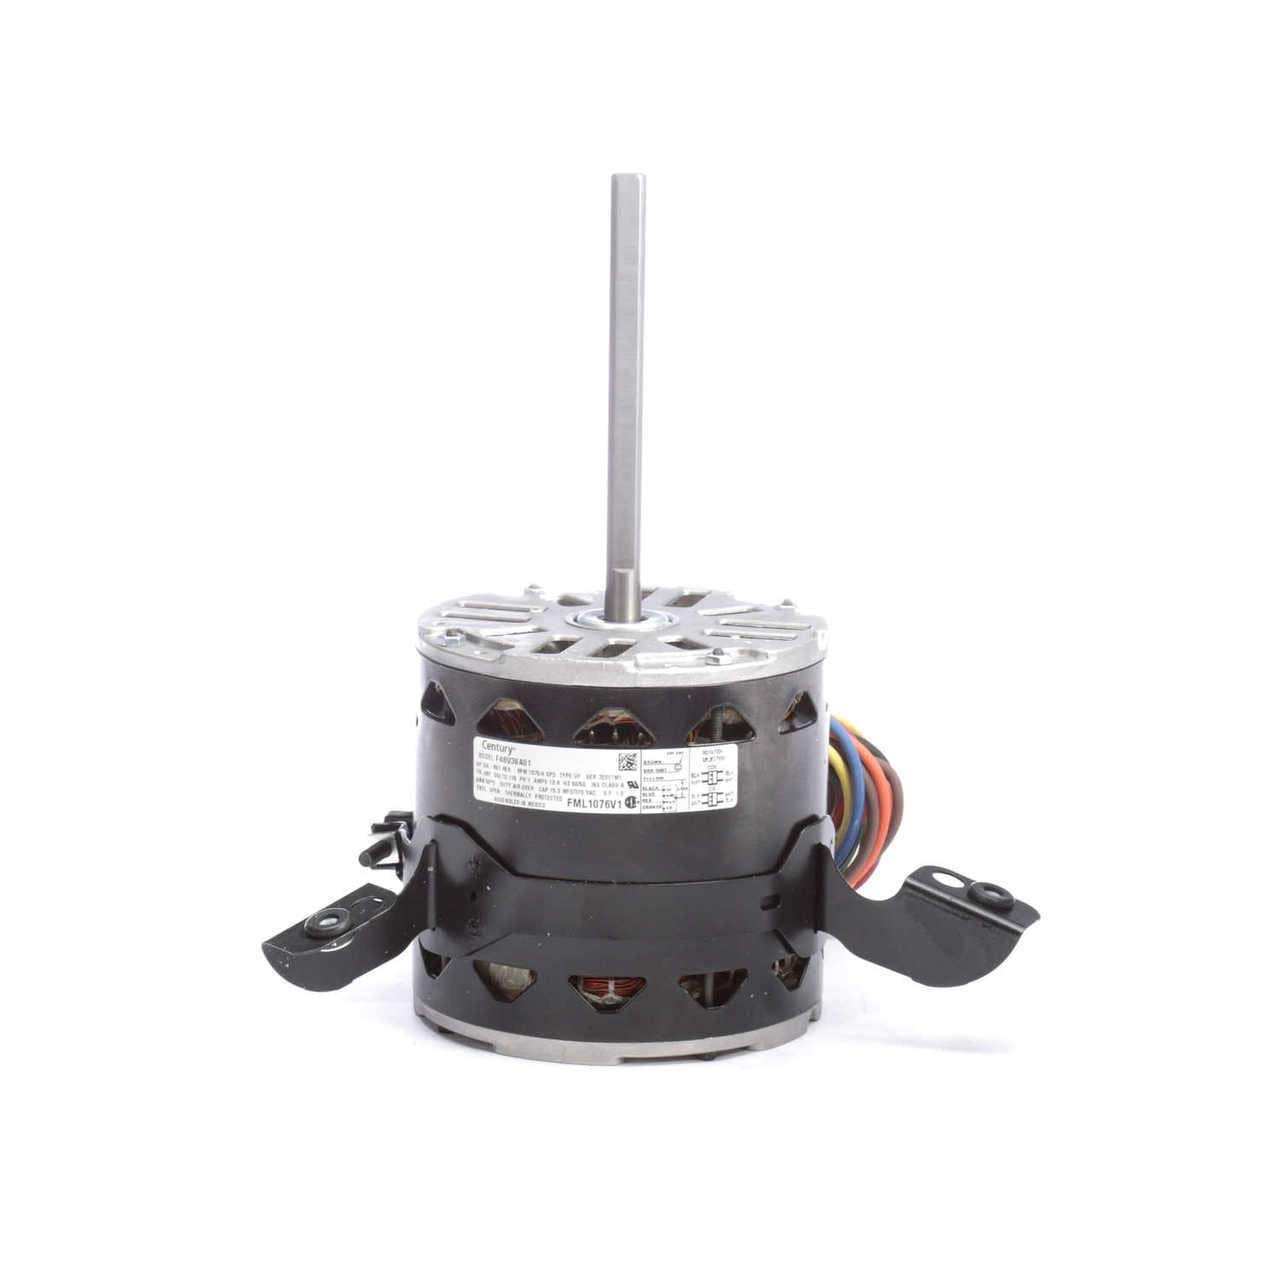 Motor, PSC, 3/4 HP, 1075 RPM, 115V, 48Y, OAO